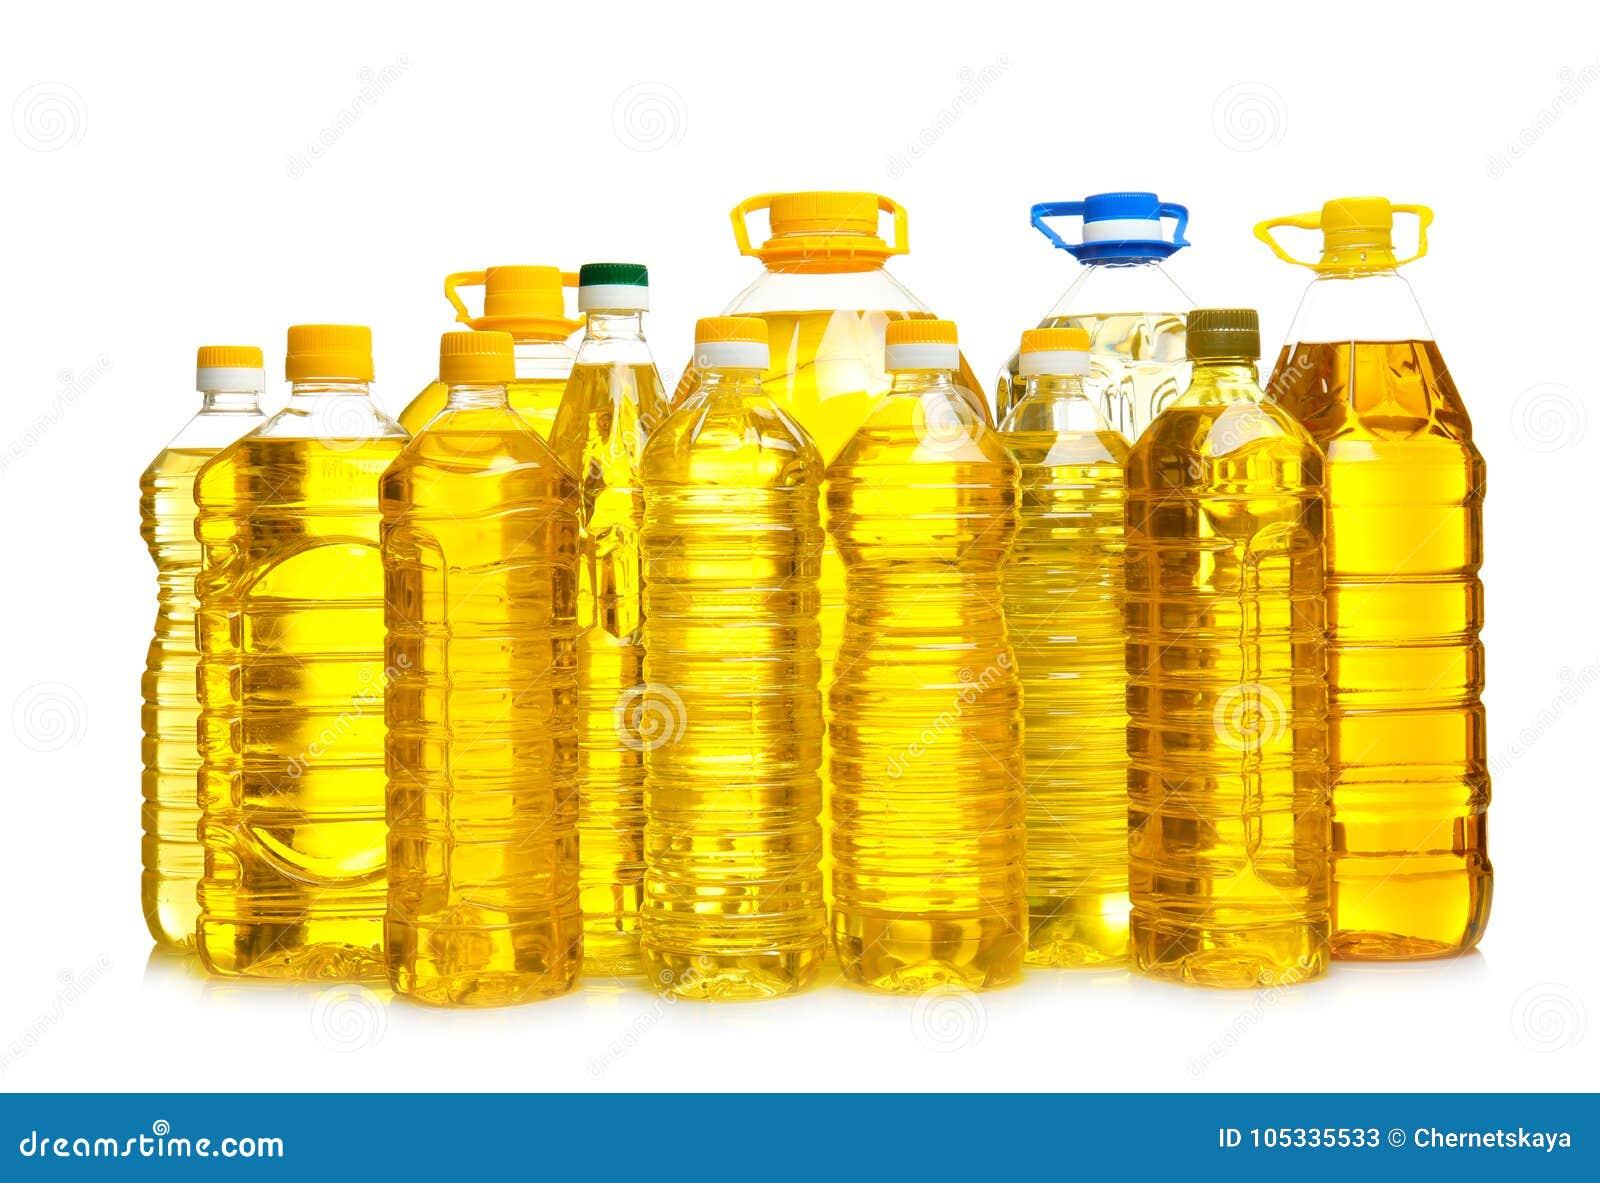 Botellas de aceite de cocina,